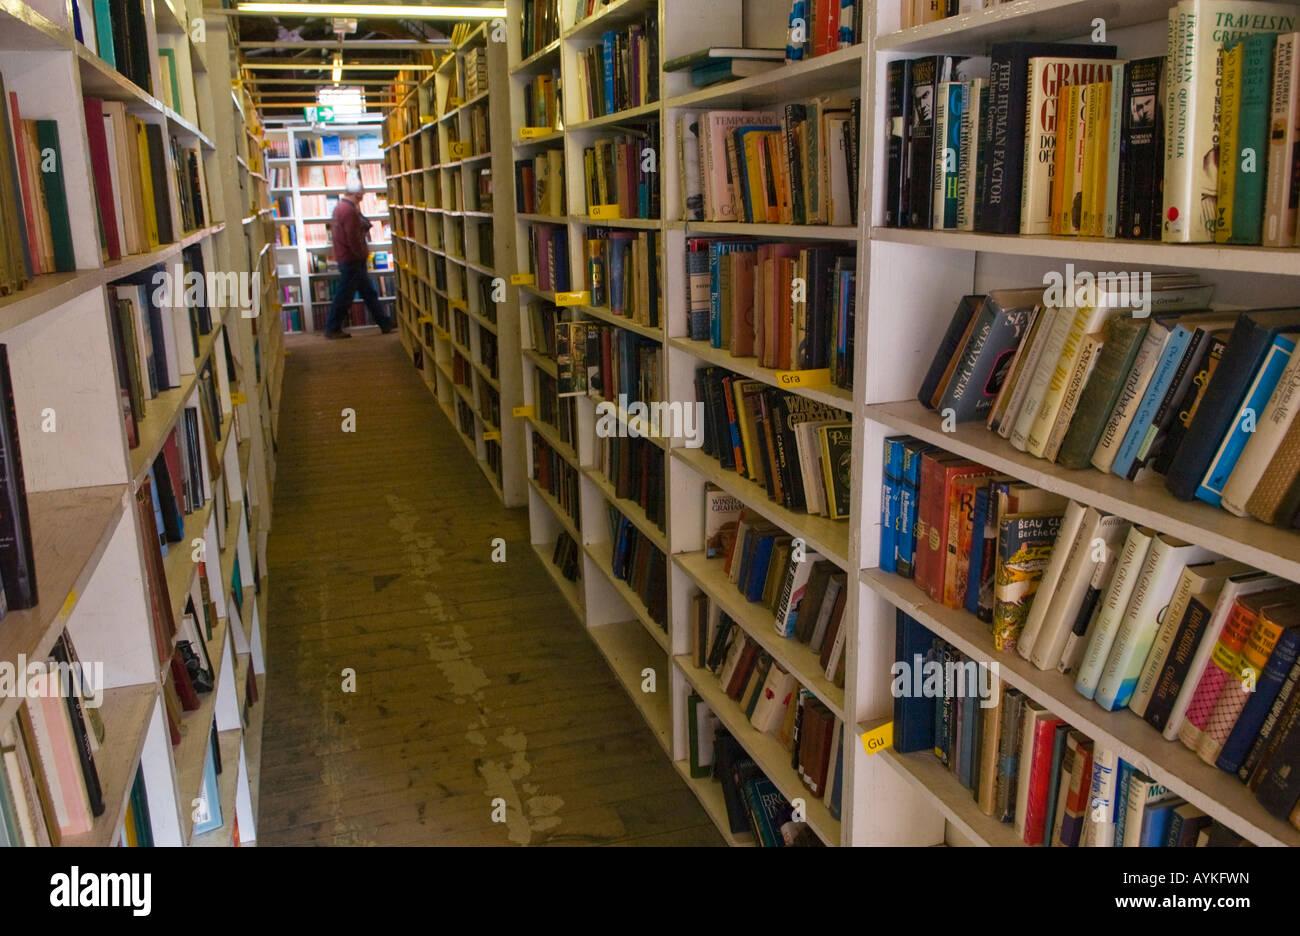 Shelf of books at Richard Booths Bookshop Hay on Wye Powys Wales UK EU the World's largest secondhand bookshop - Stock Image